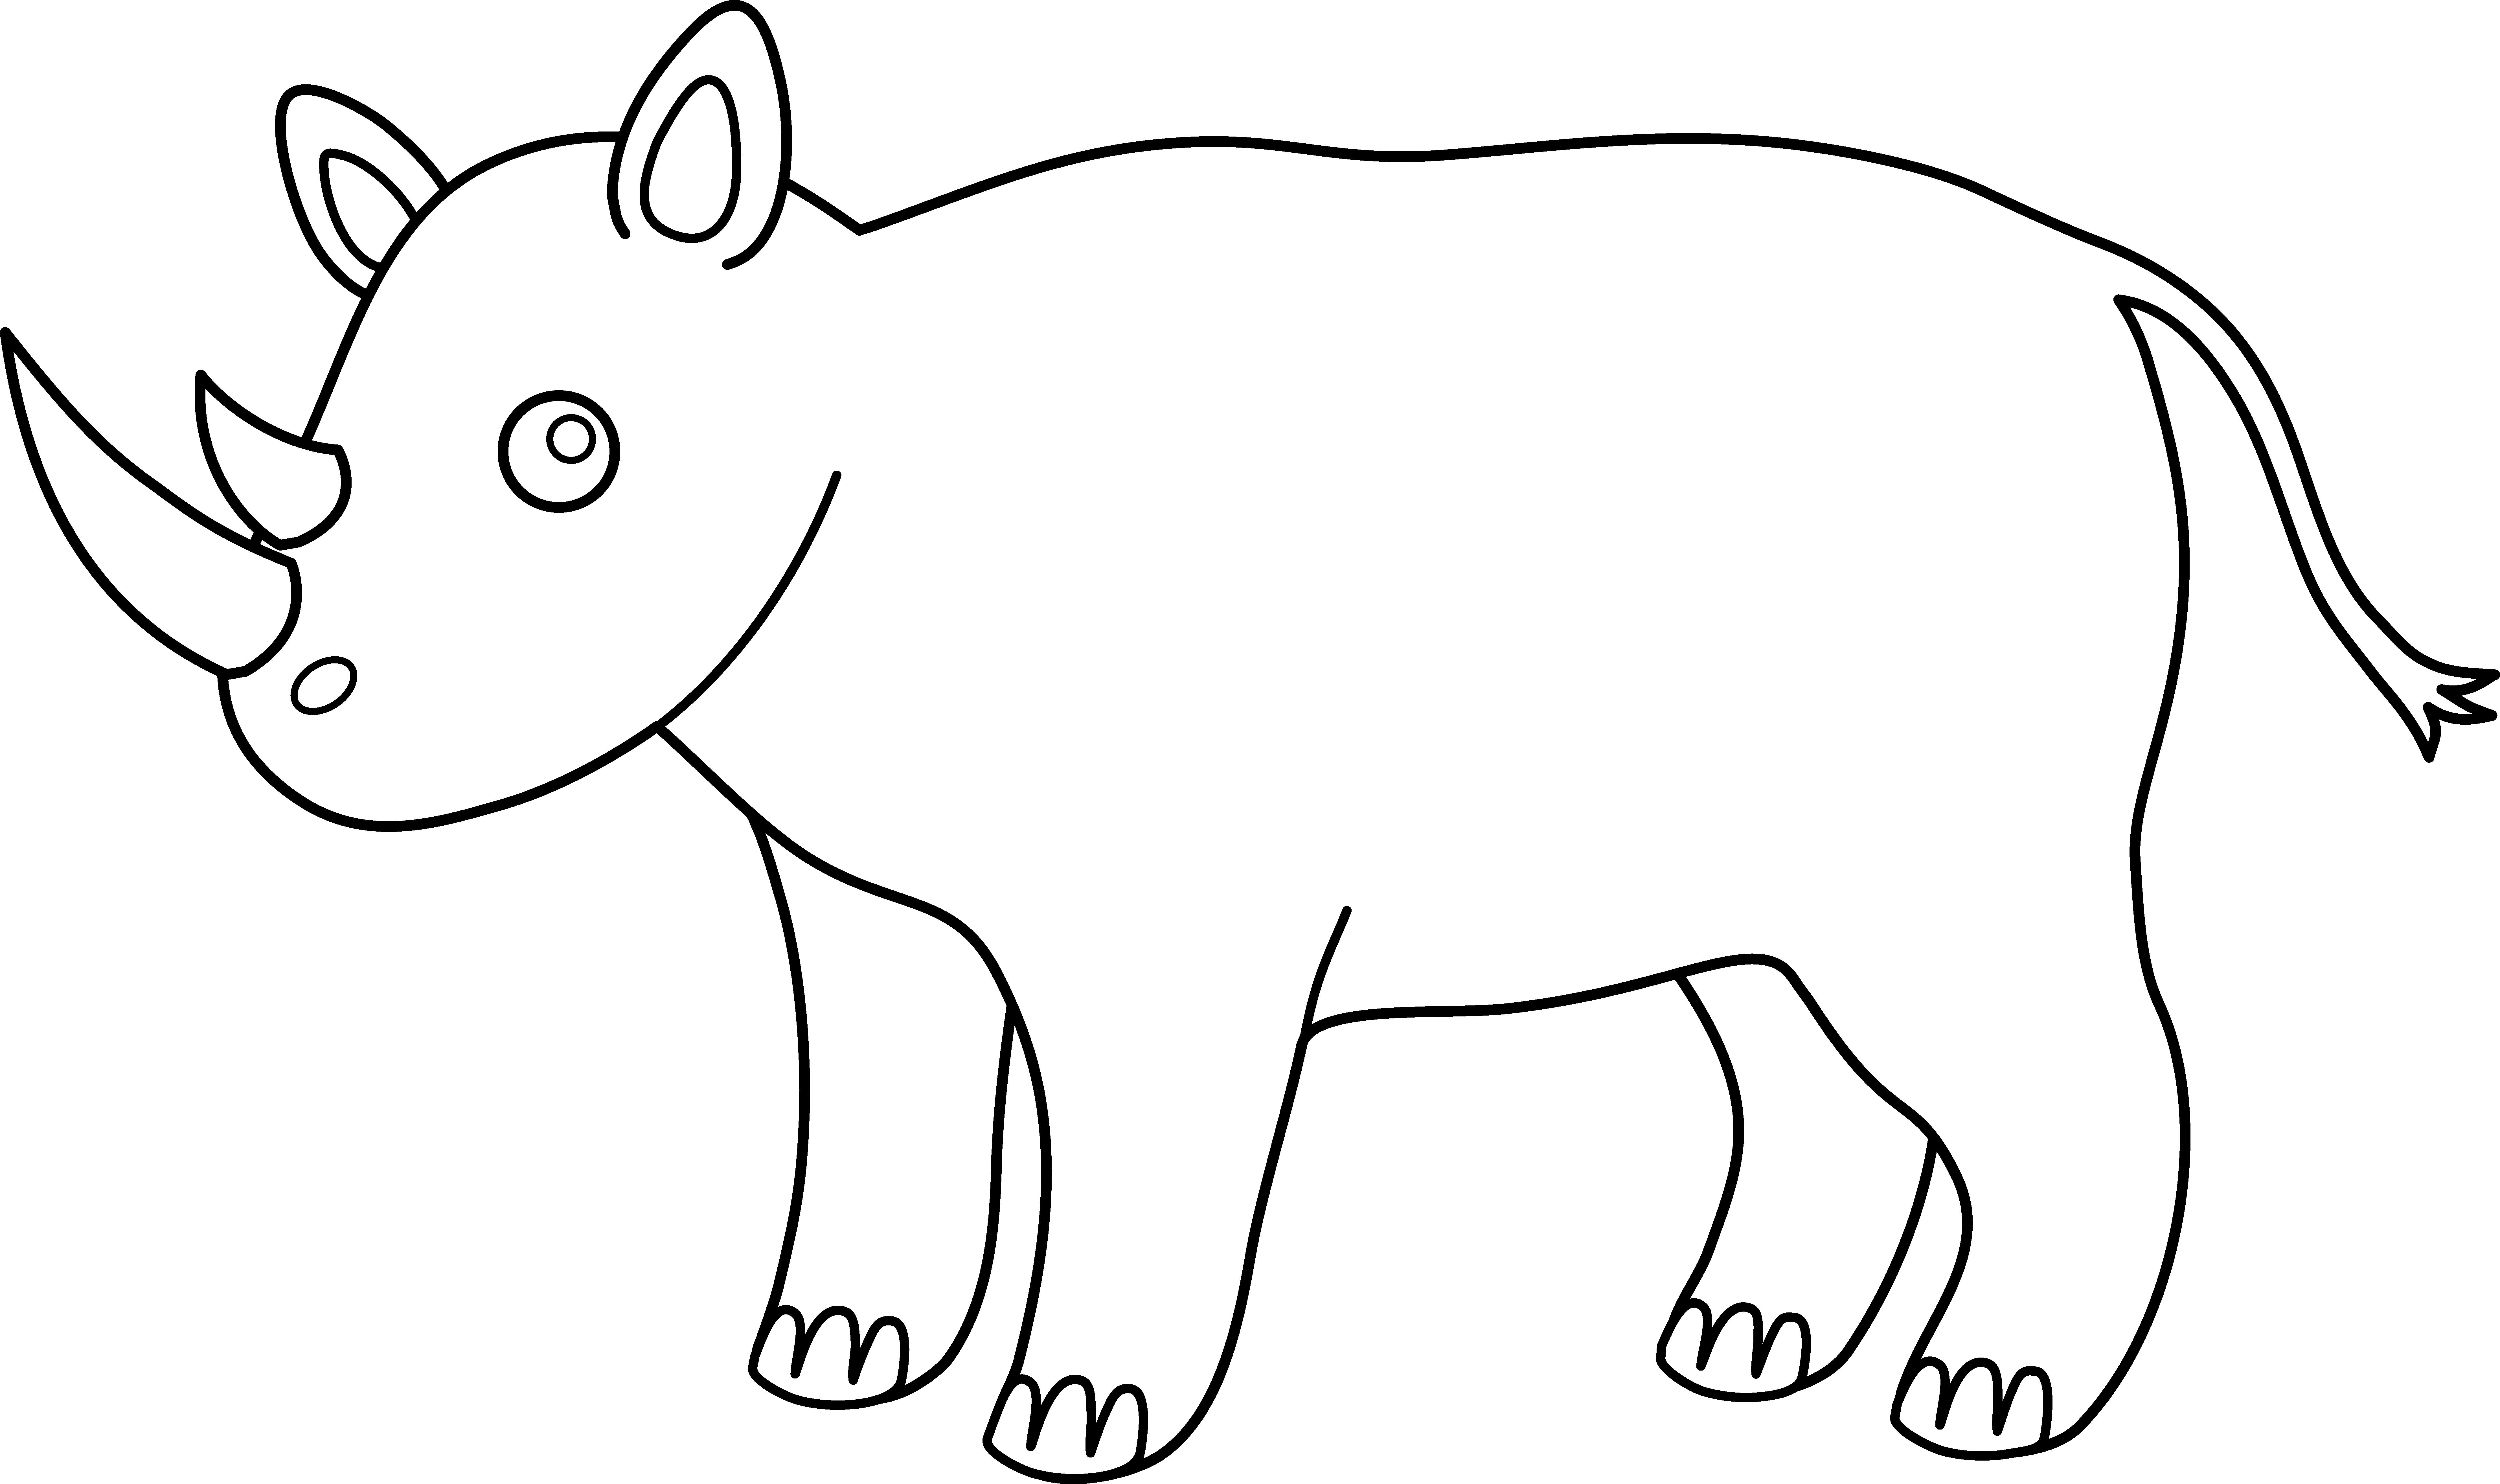 Rhino clipart african animal #2